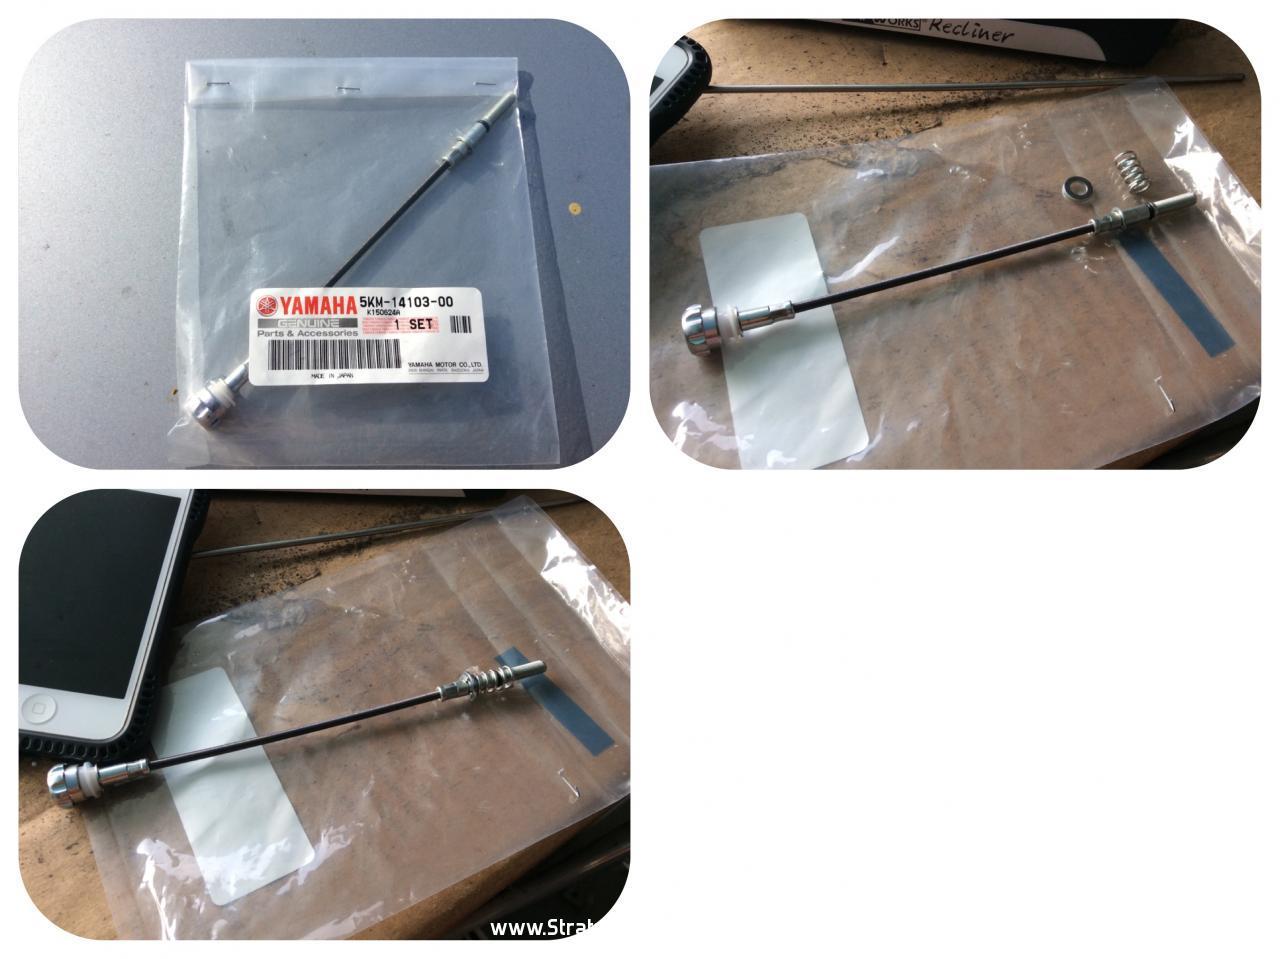 CABLE ADJUSTER 5KM-14103-00-00, YAMAHA GRIZZLY 660 CARBURETOR IDLE SCREW SET